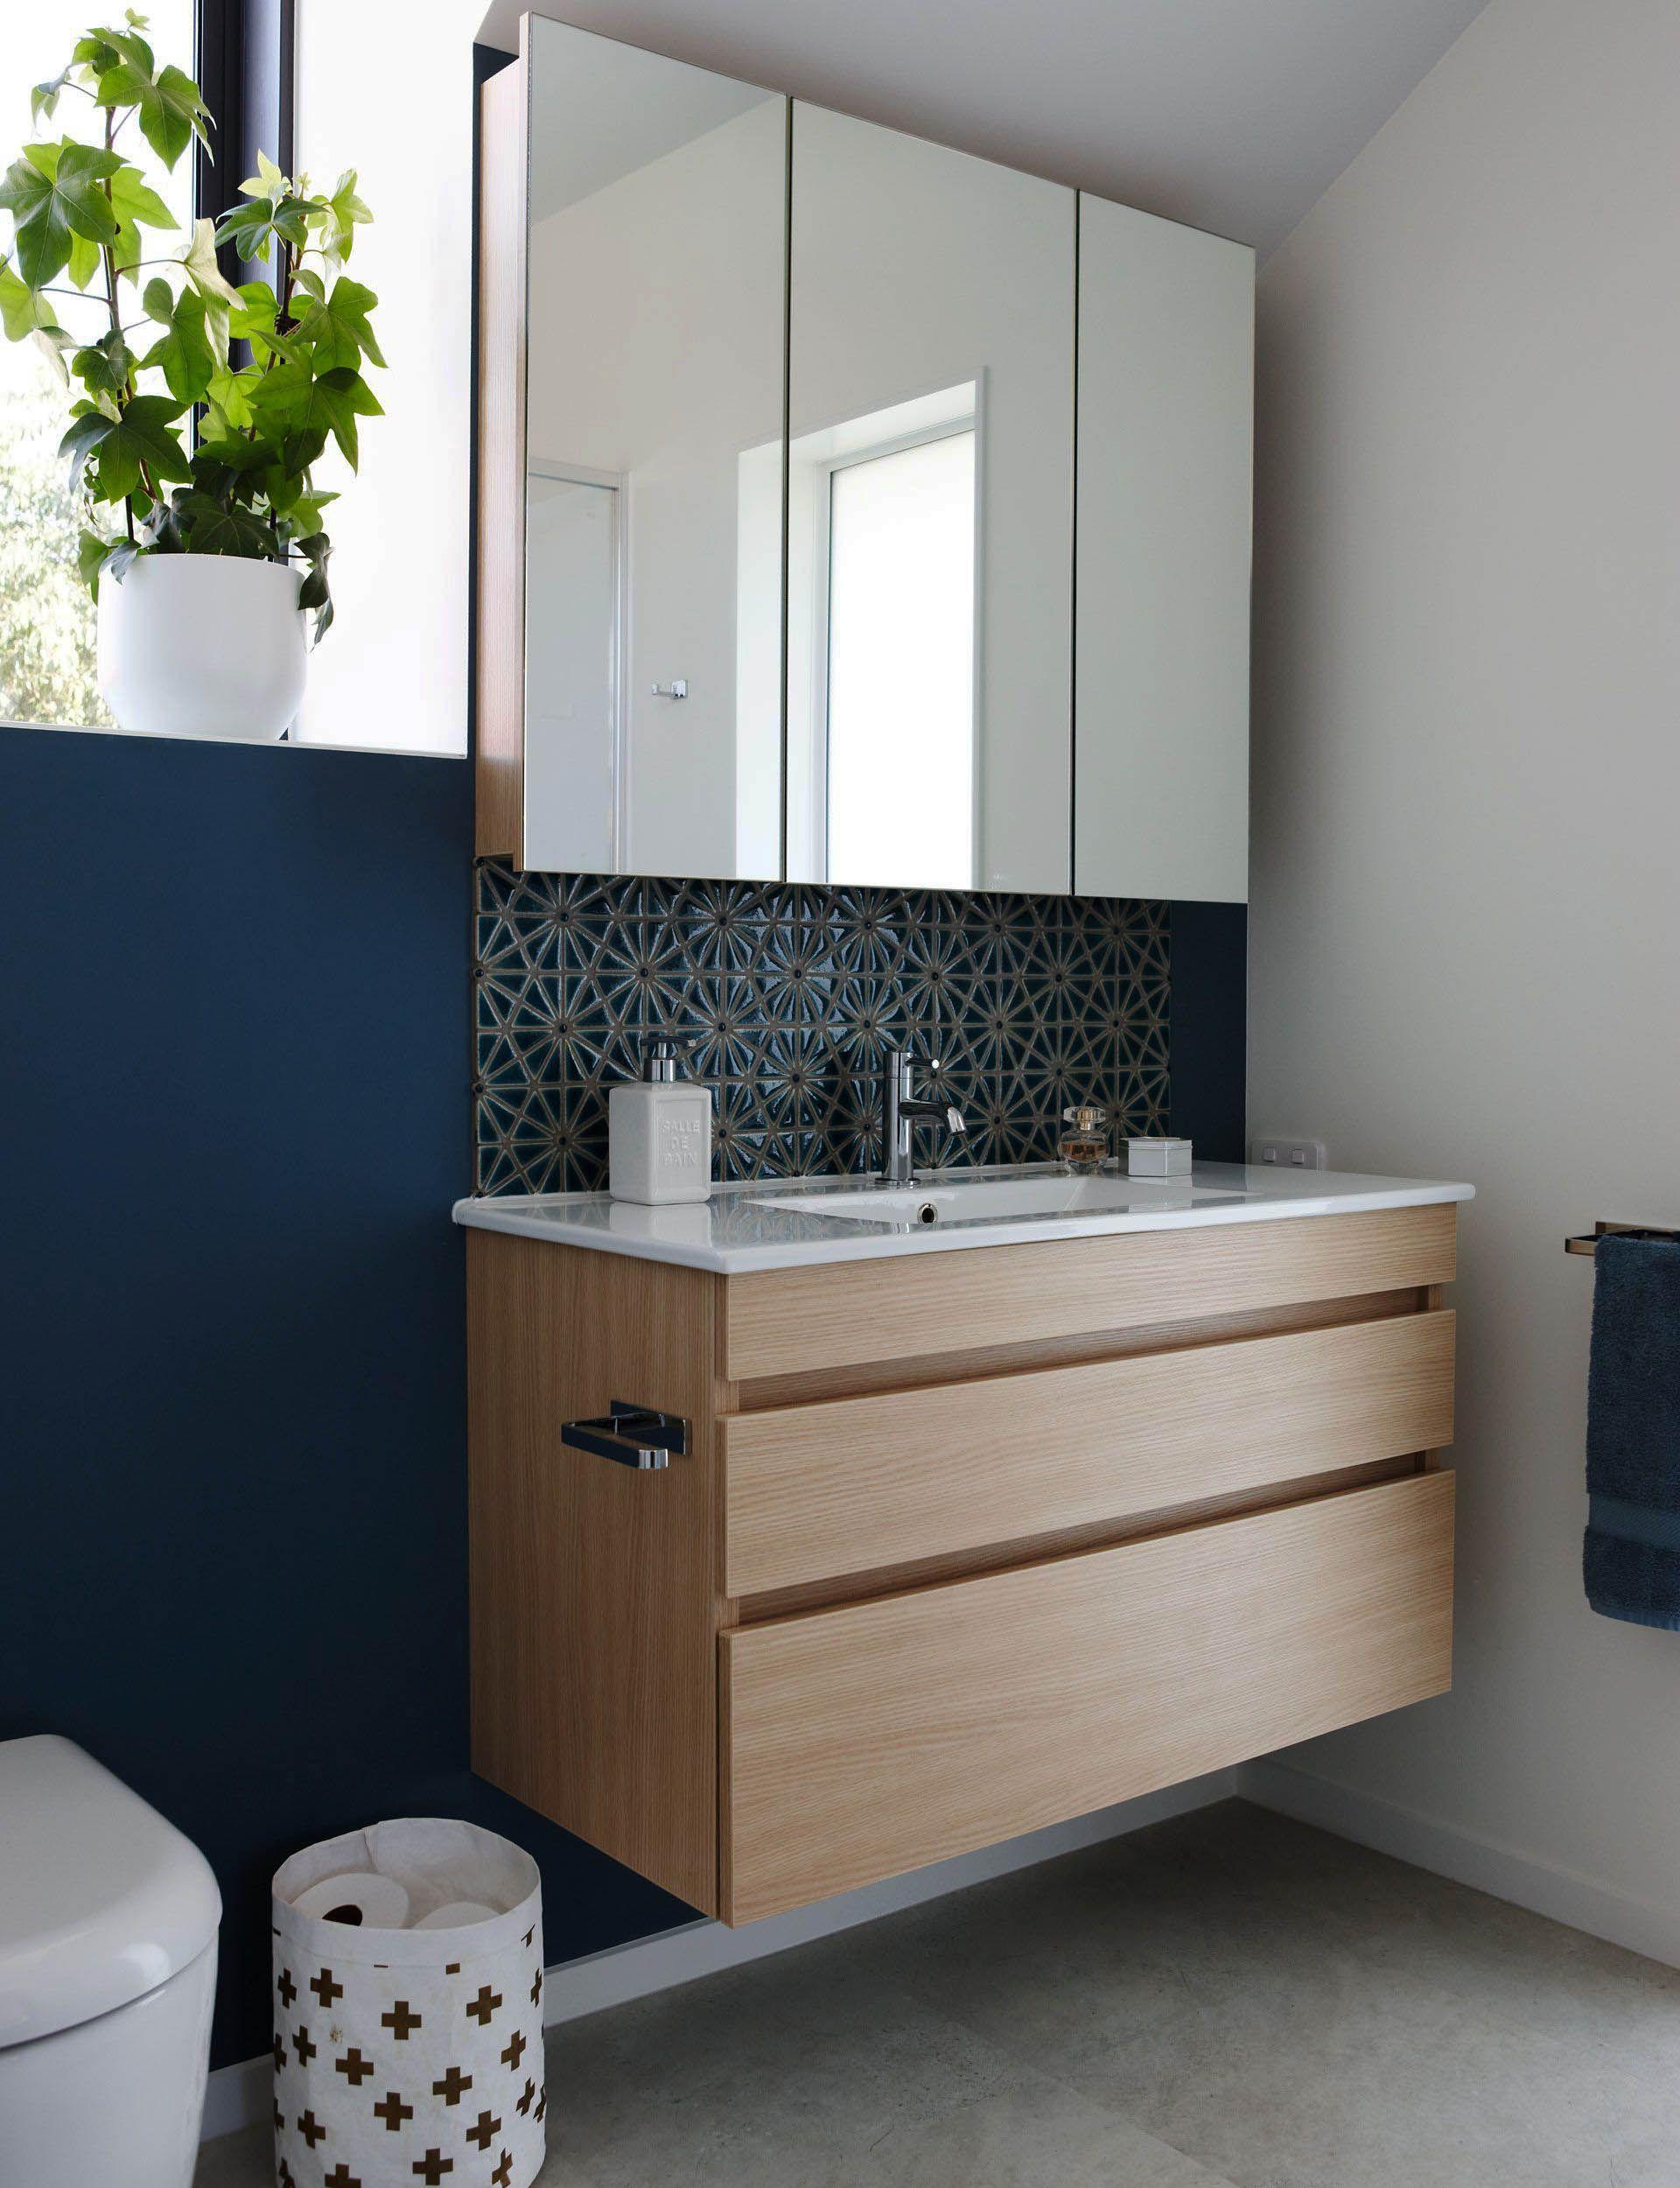 Brilliant Shower Room Storing Ideas Bathroom Shelf Decor